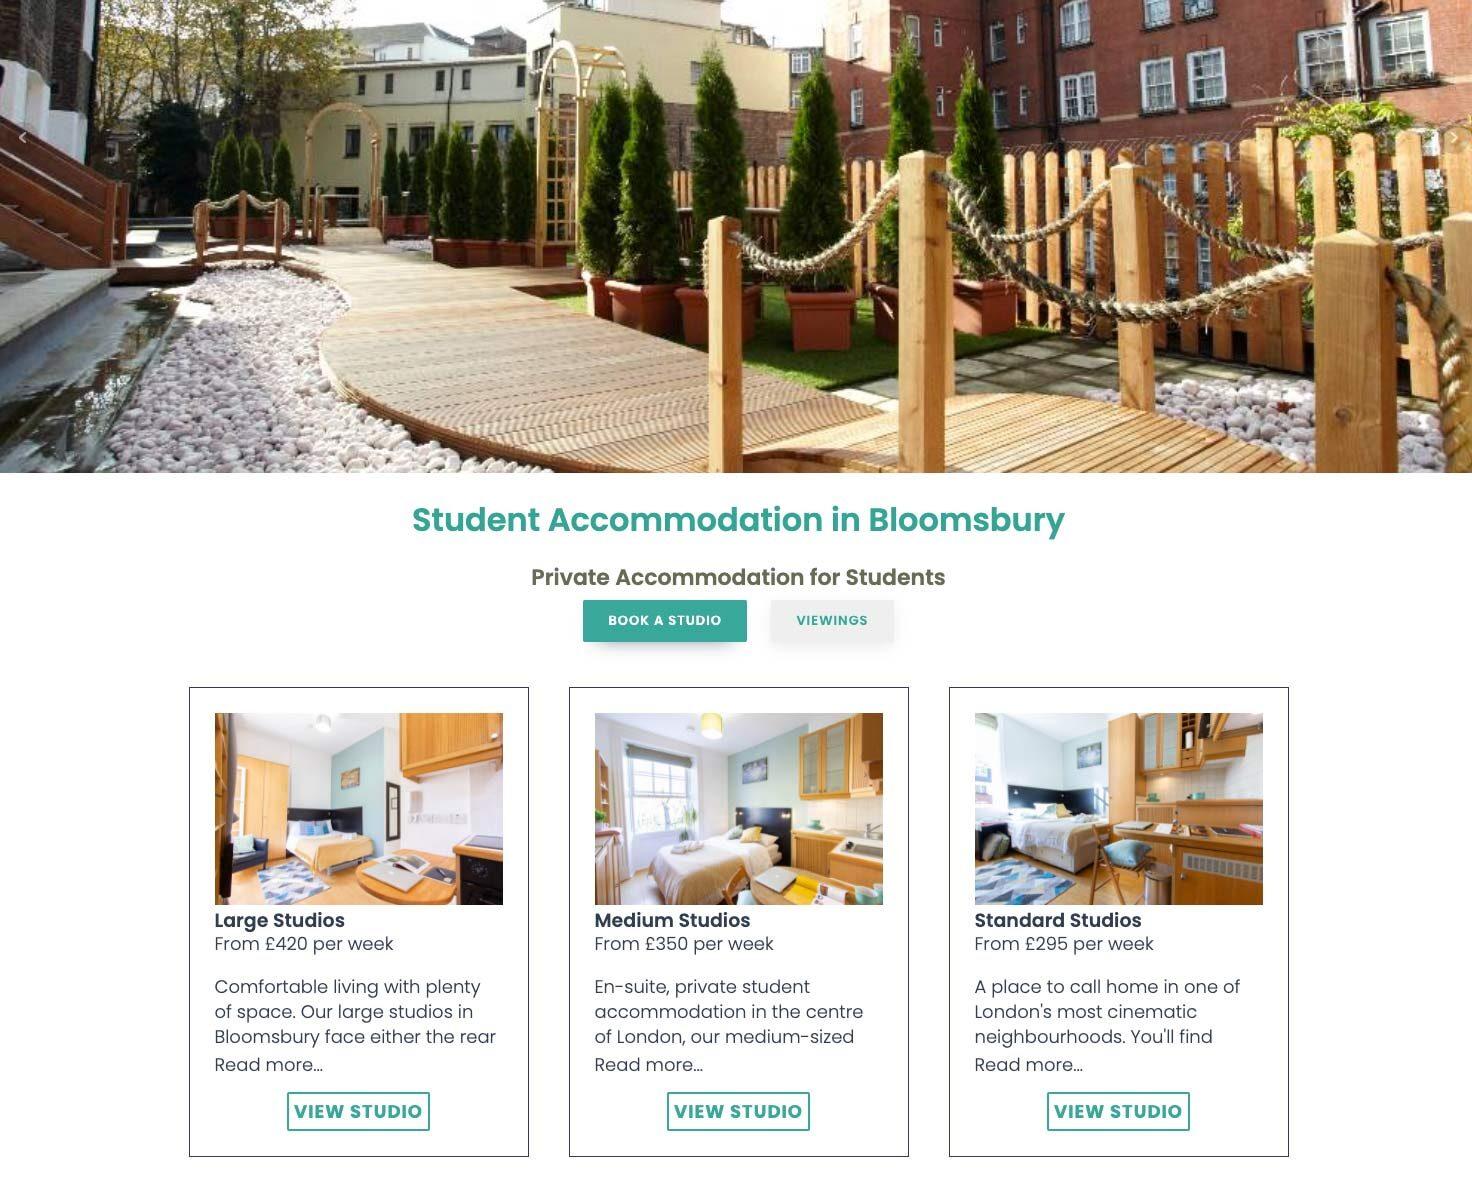 Digital marketing for student accommodation provider